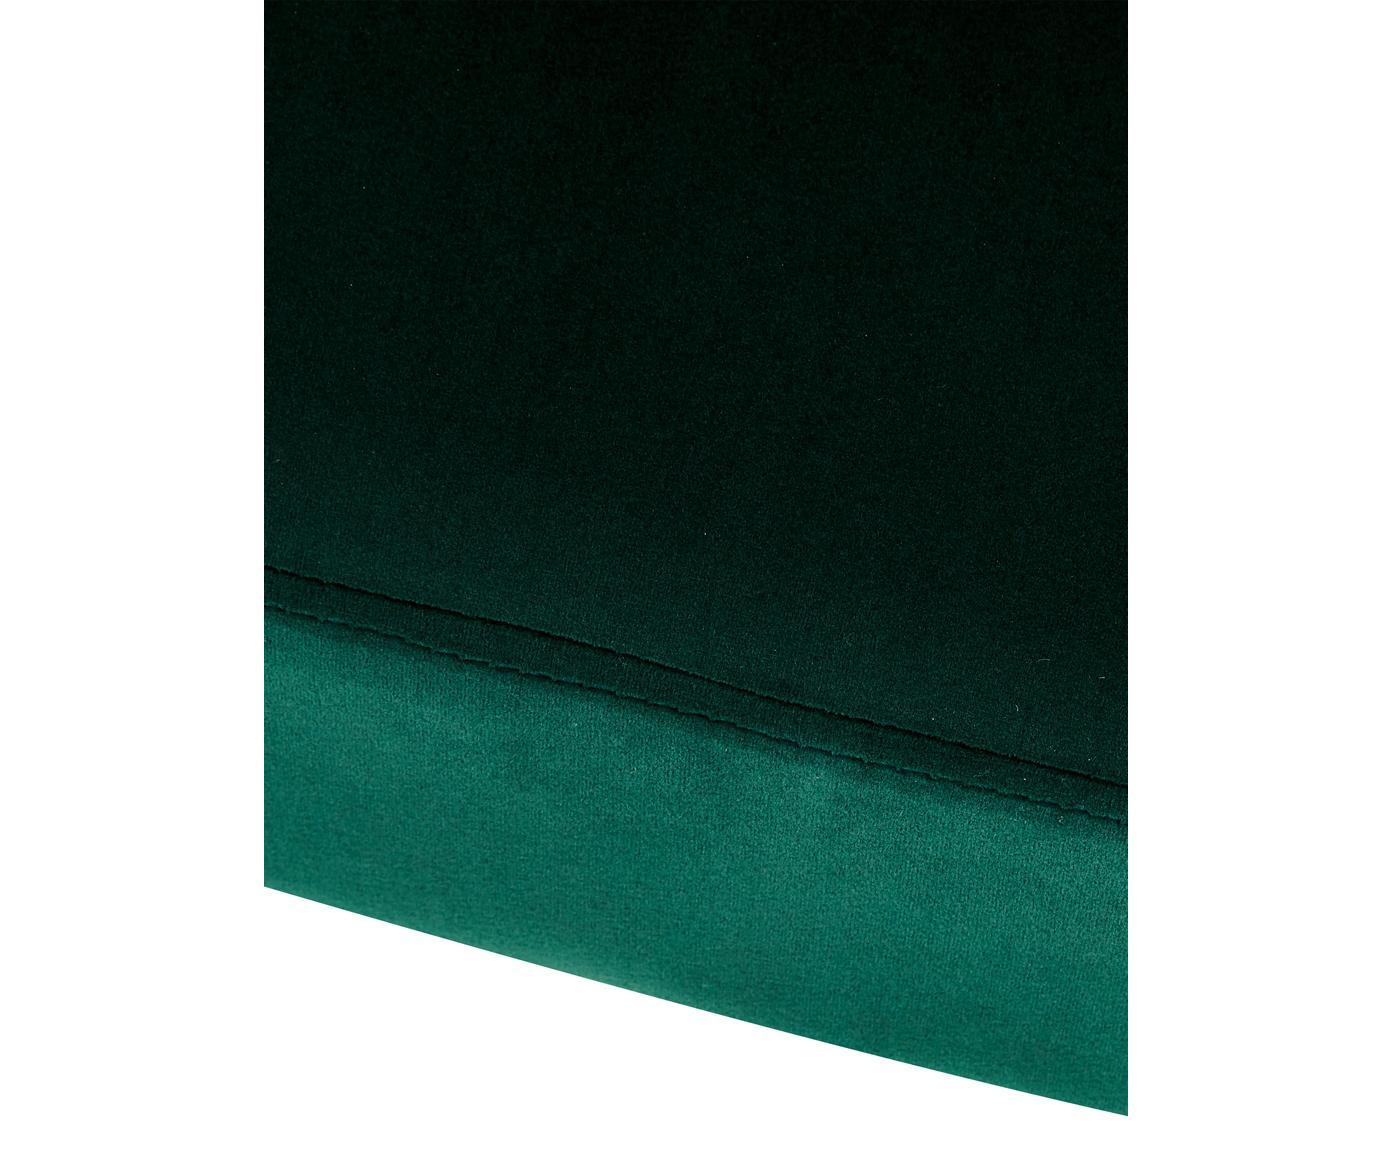 Samt-Cocktailsessel Helle, Bezug: Samt (Polyester) 30.000 S, Füße: Metall, pulverbeschichtet, Samt Dunkelgrün, 65 x 84 cm